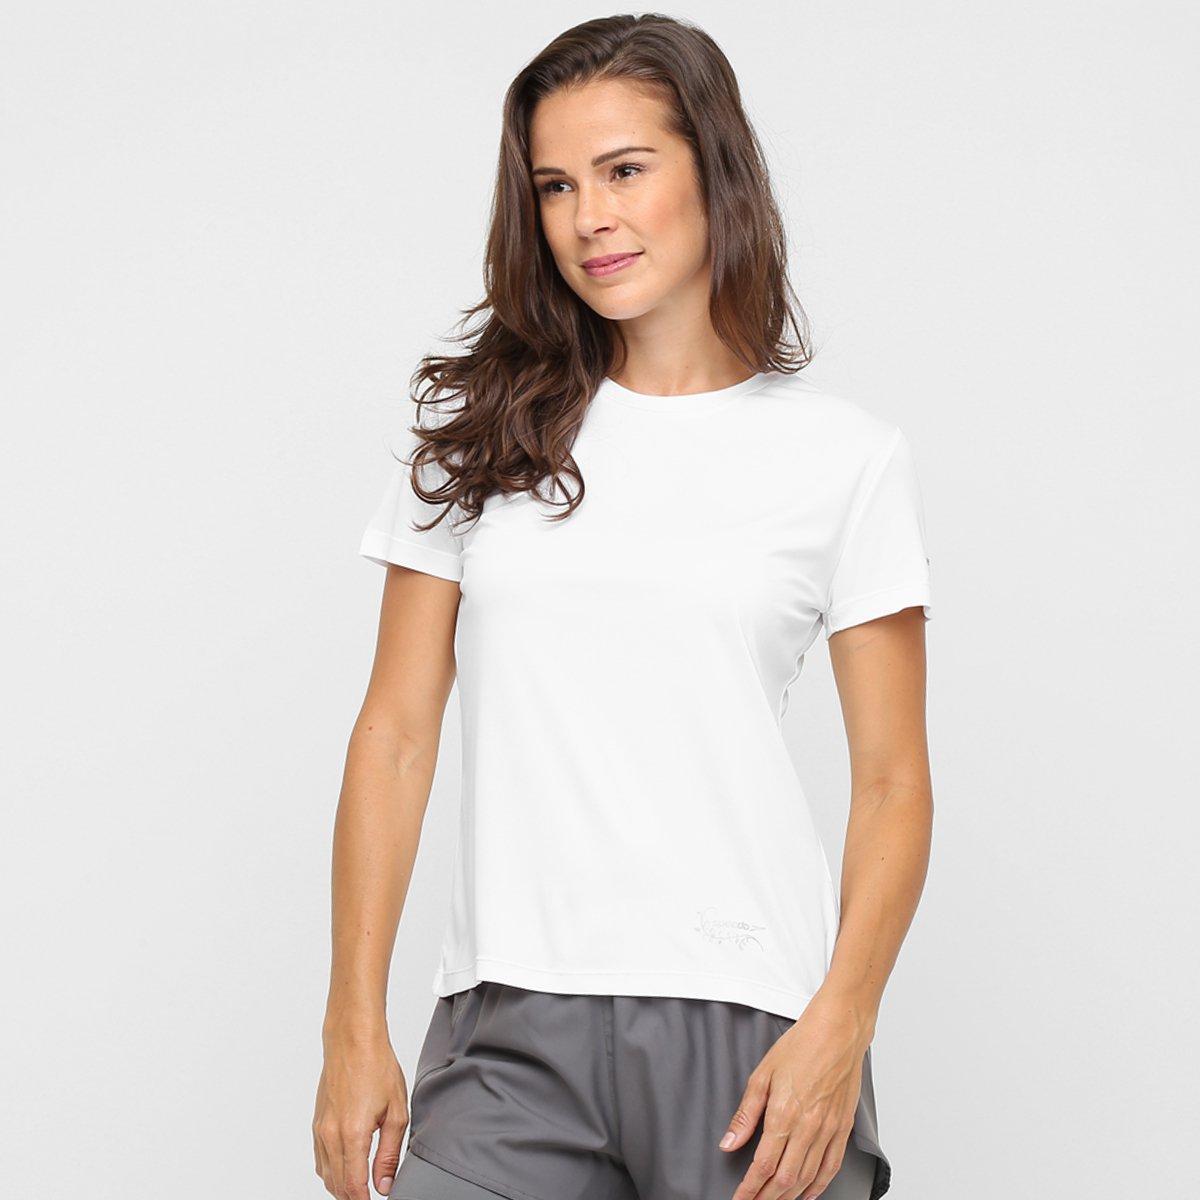 Camiseta Branco UV Com Camiseta Speedo Interlock Proteção Feminina Interlock Speedo 1cWZaOpp6